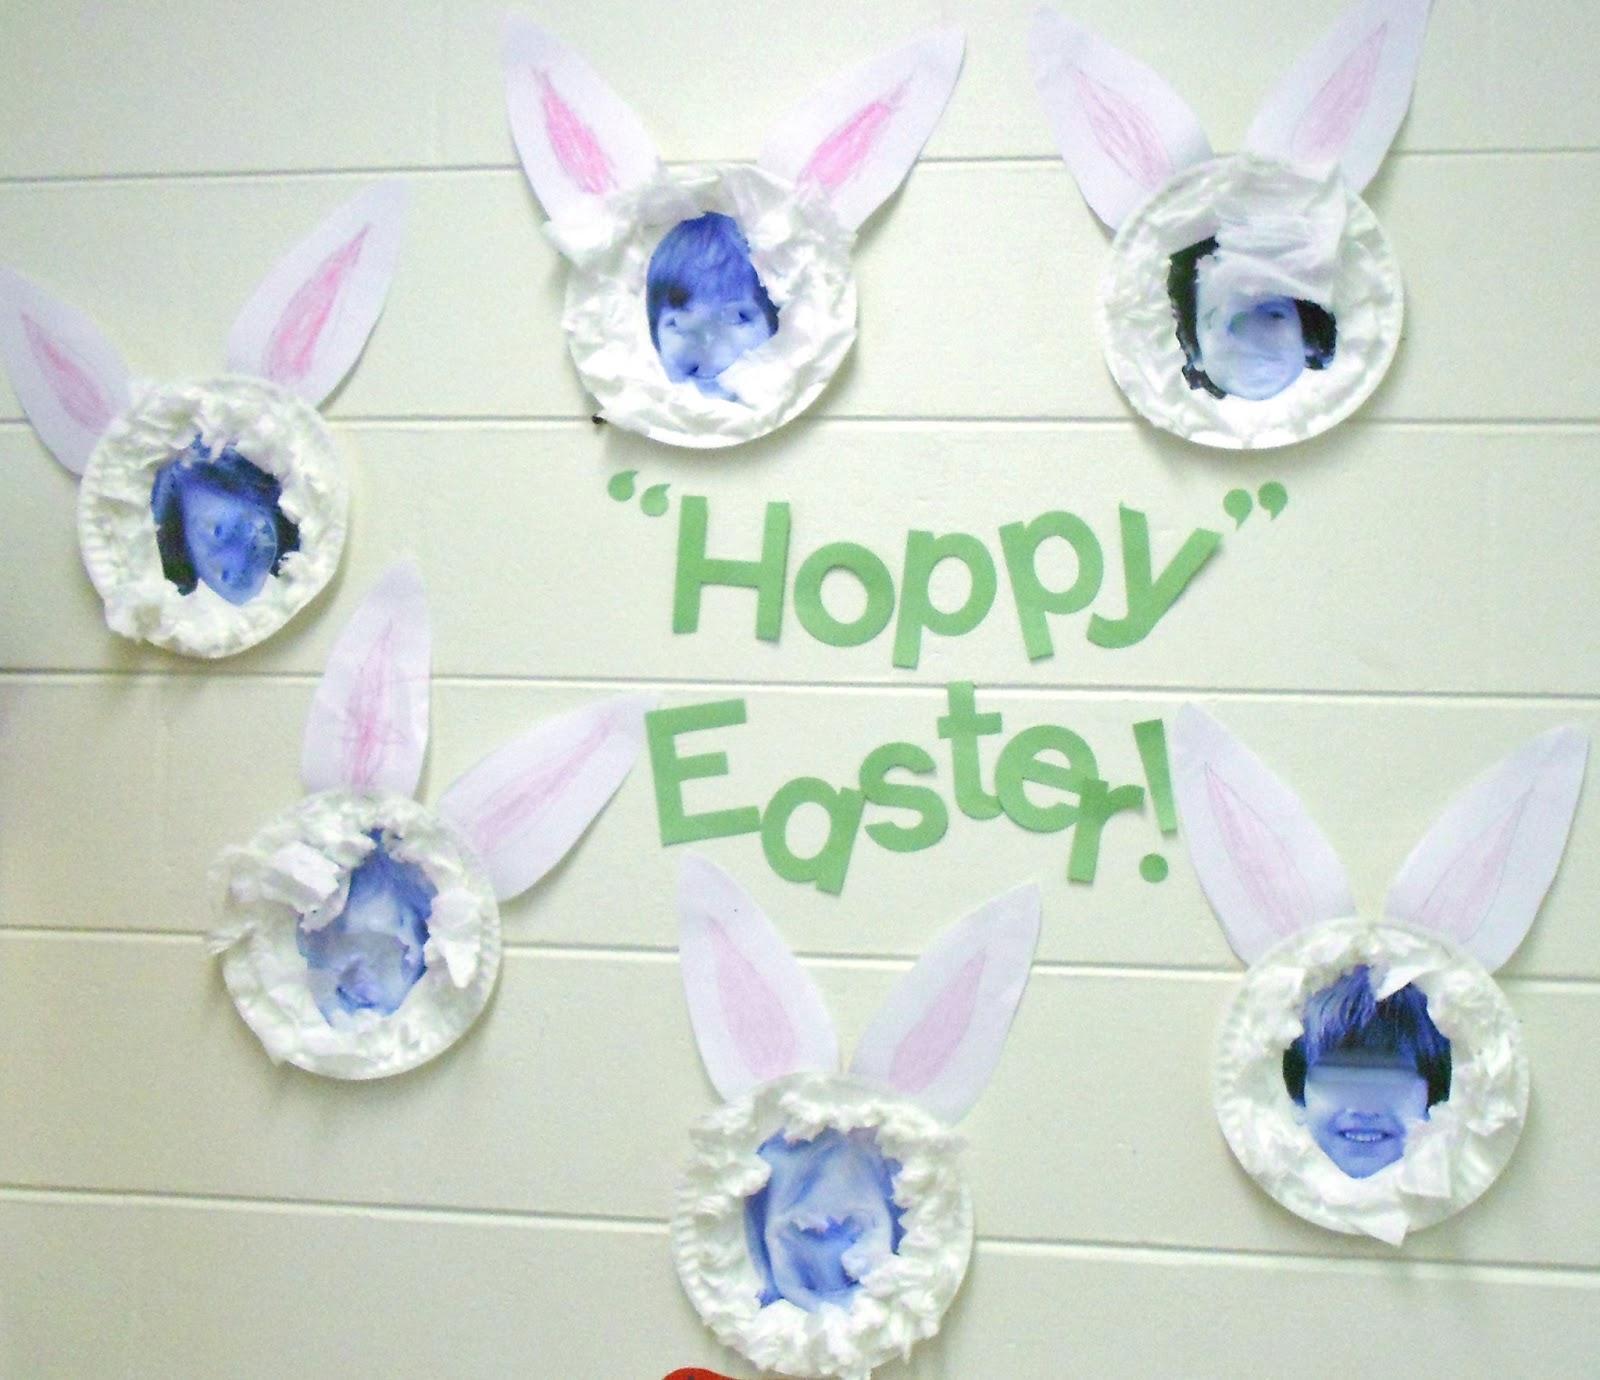 Princesses, Pies, & Preschool Pizzazz: Easter Displays for Children